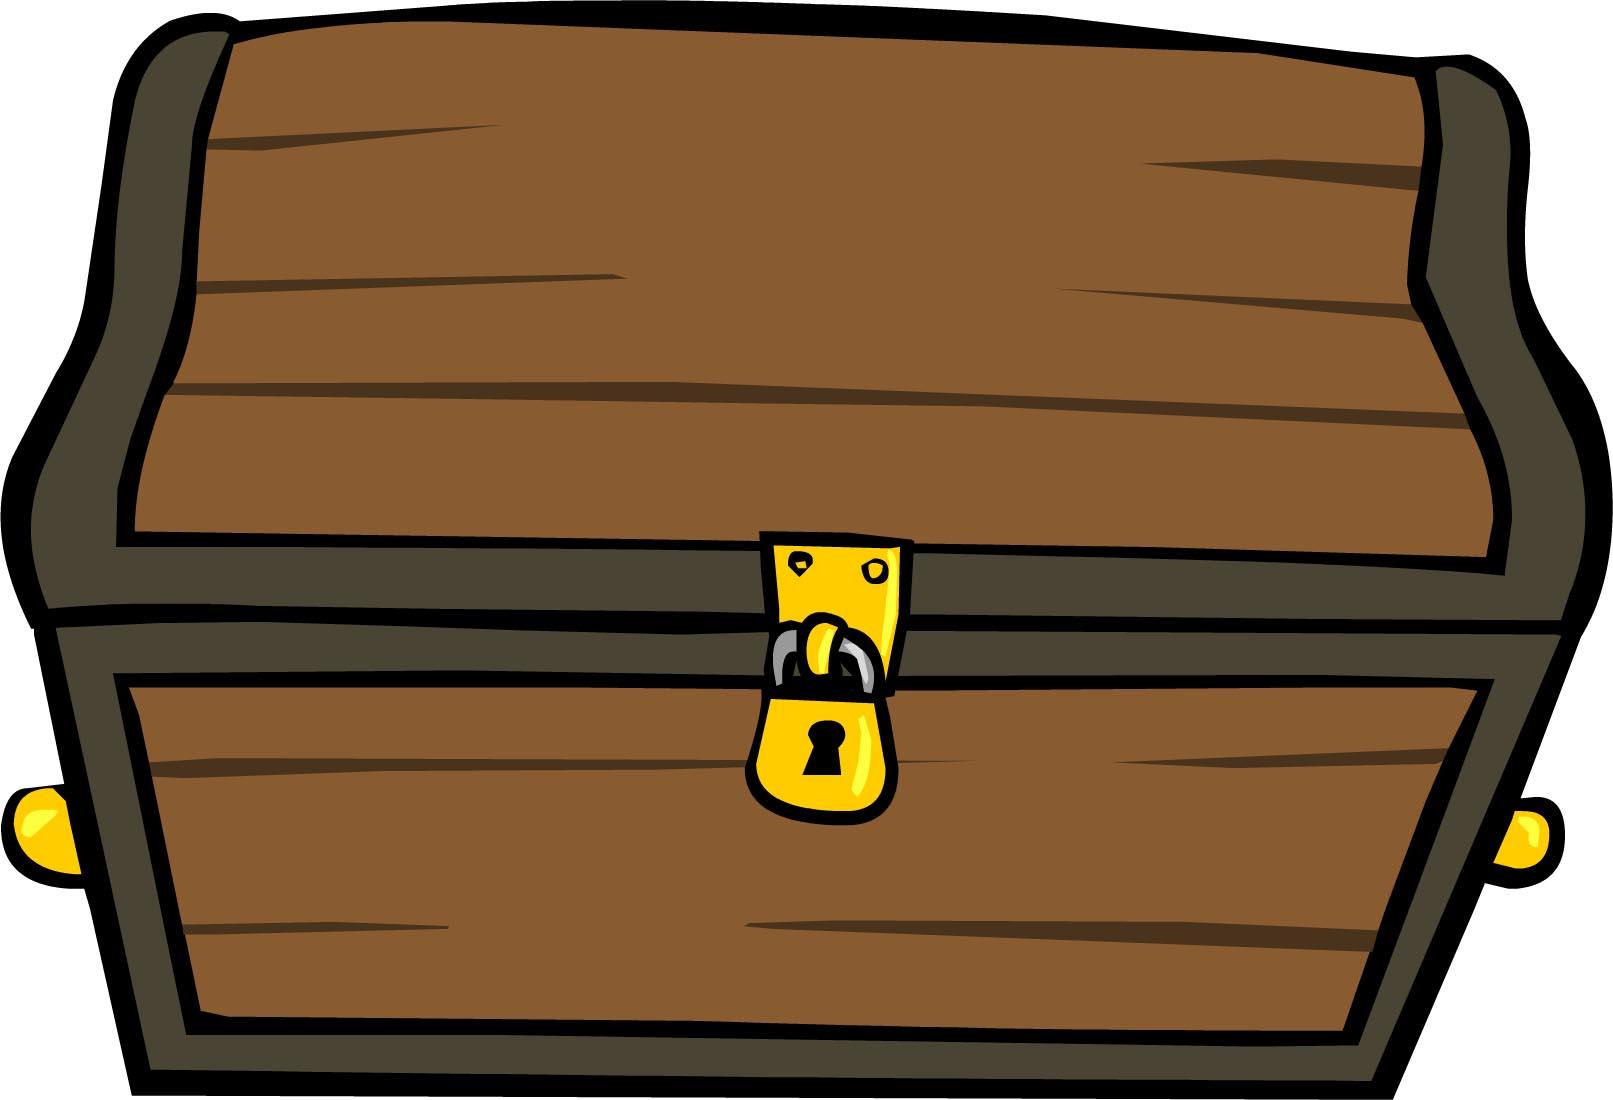 Treasure clipart locked box. Chest with lock free